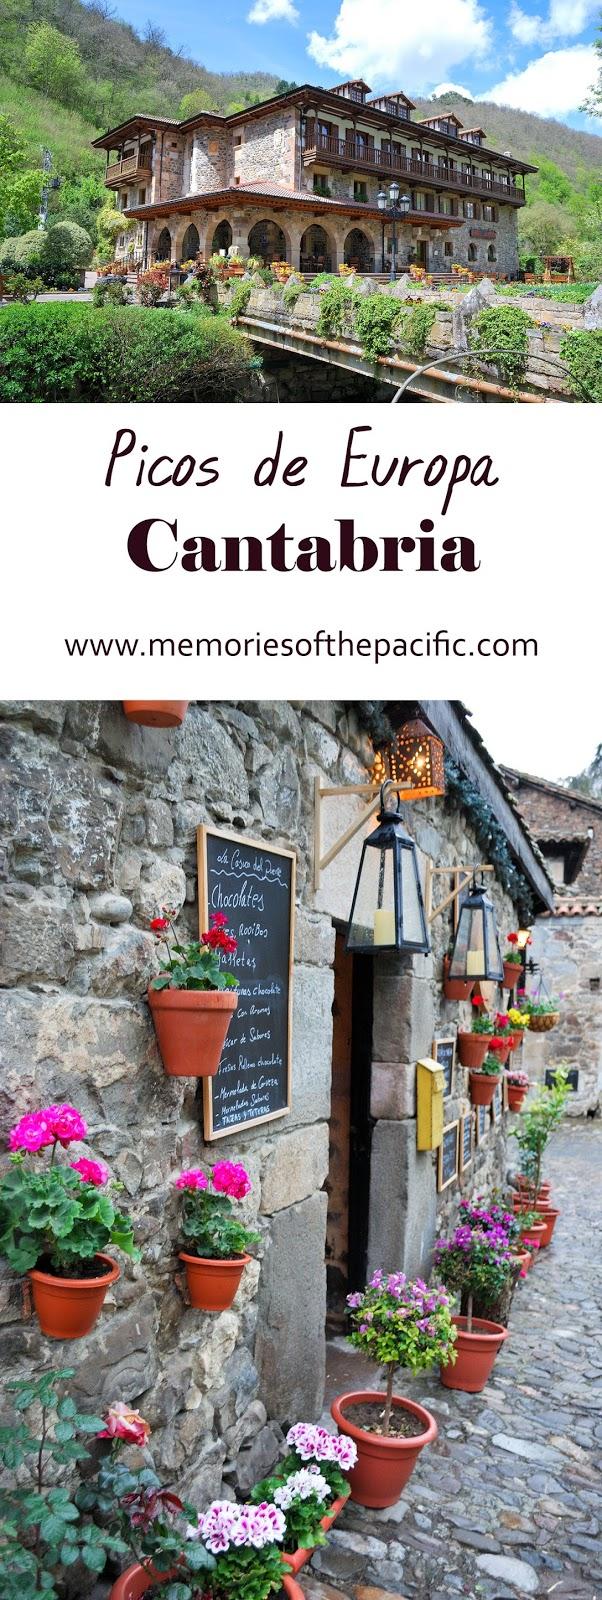 potes cantabria mountains spain picos europa flores tienda flower hotel del oso cosgaya